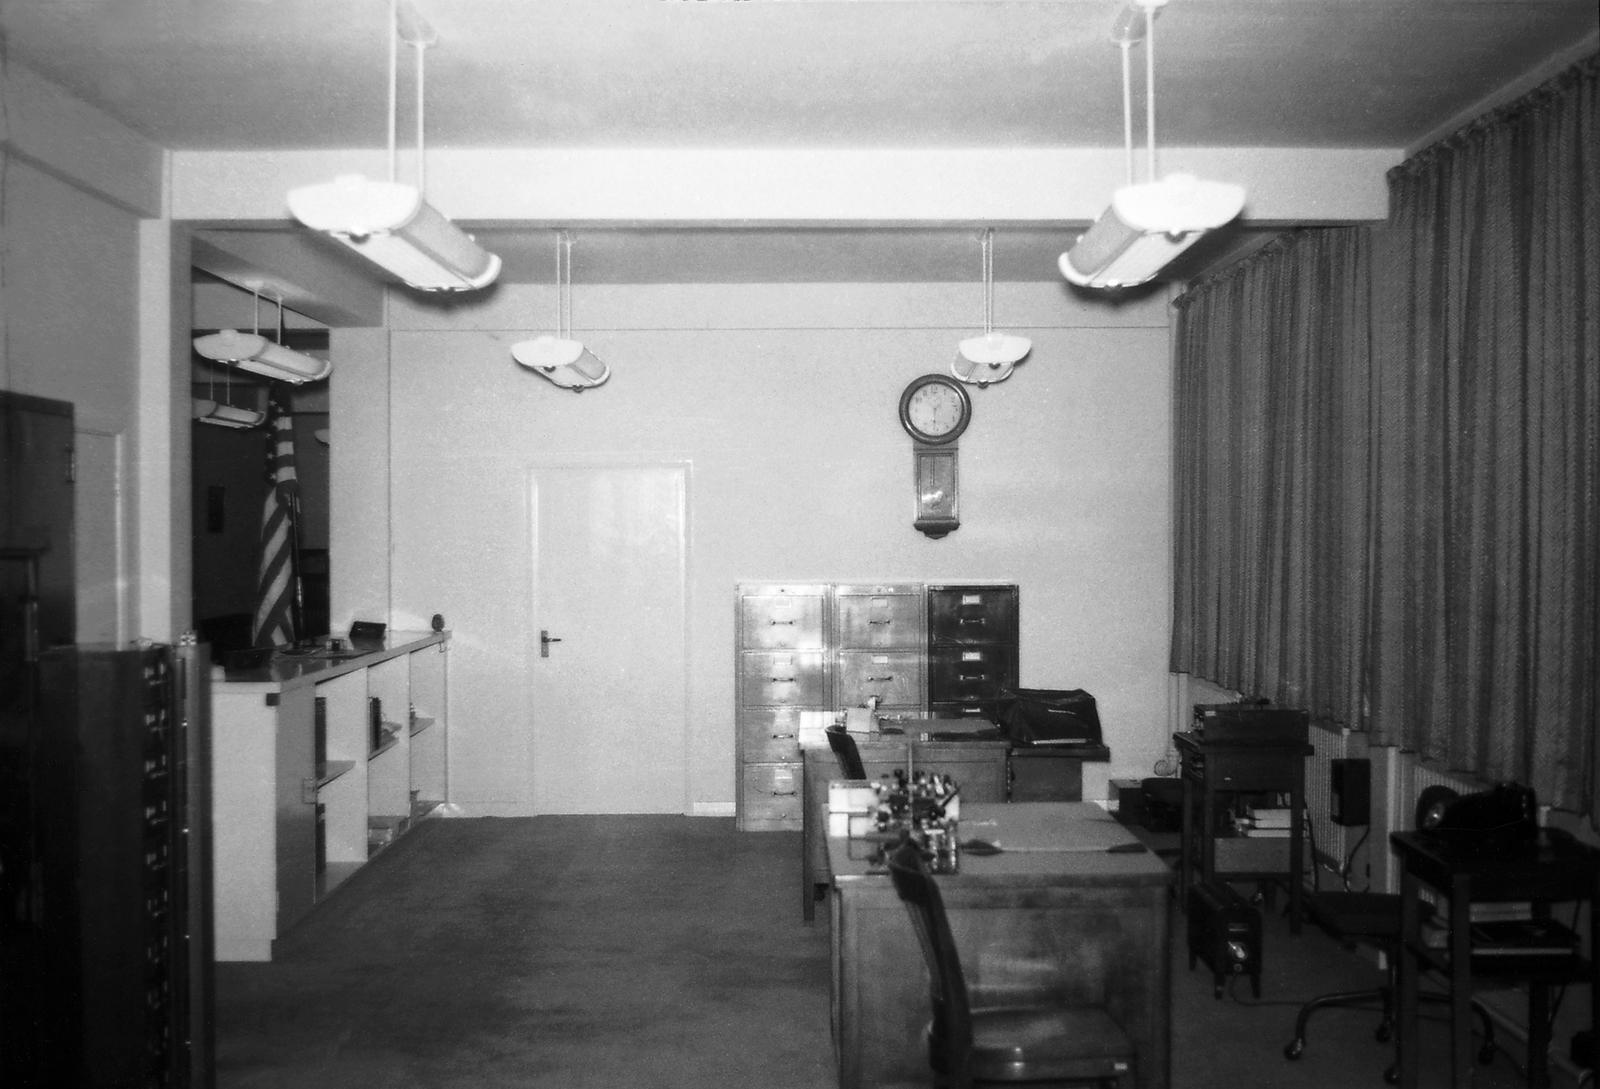 Belfast - Consulate Office Building - 1960